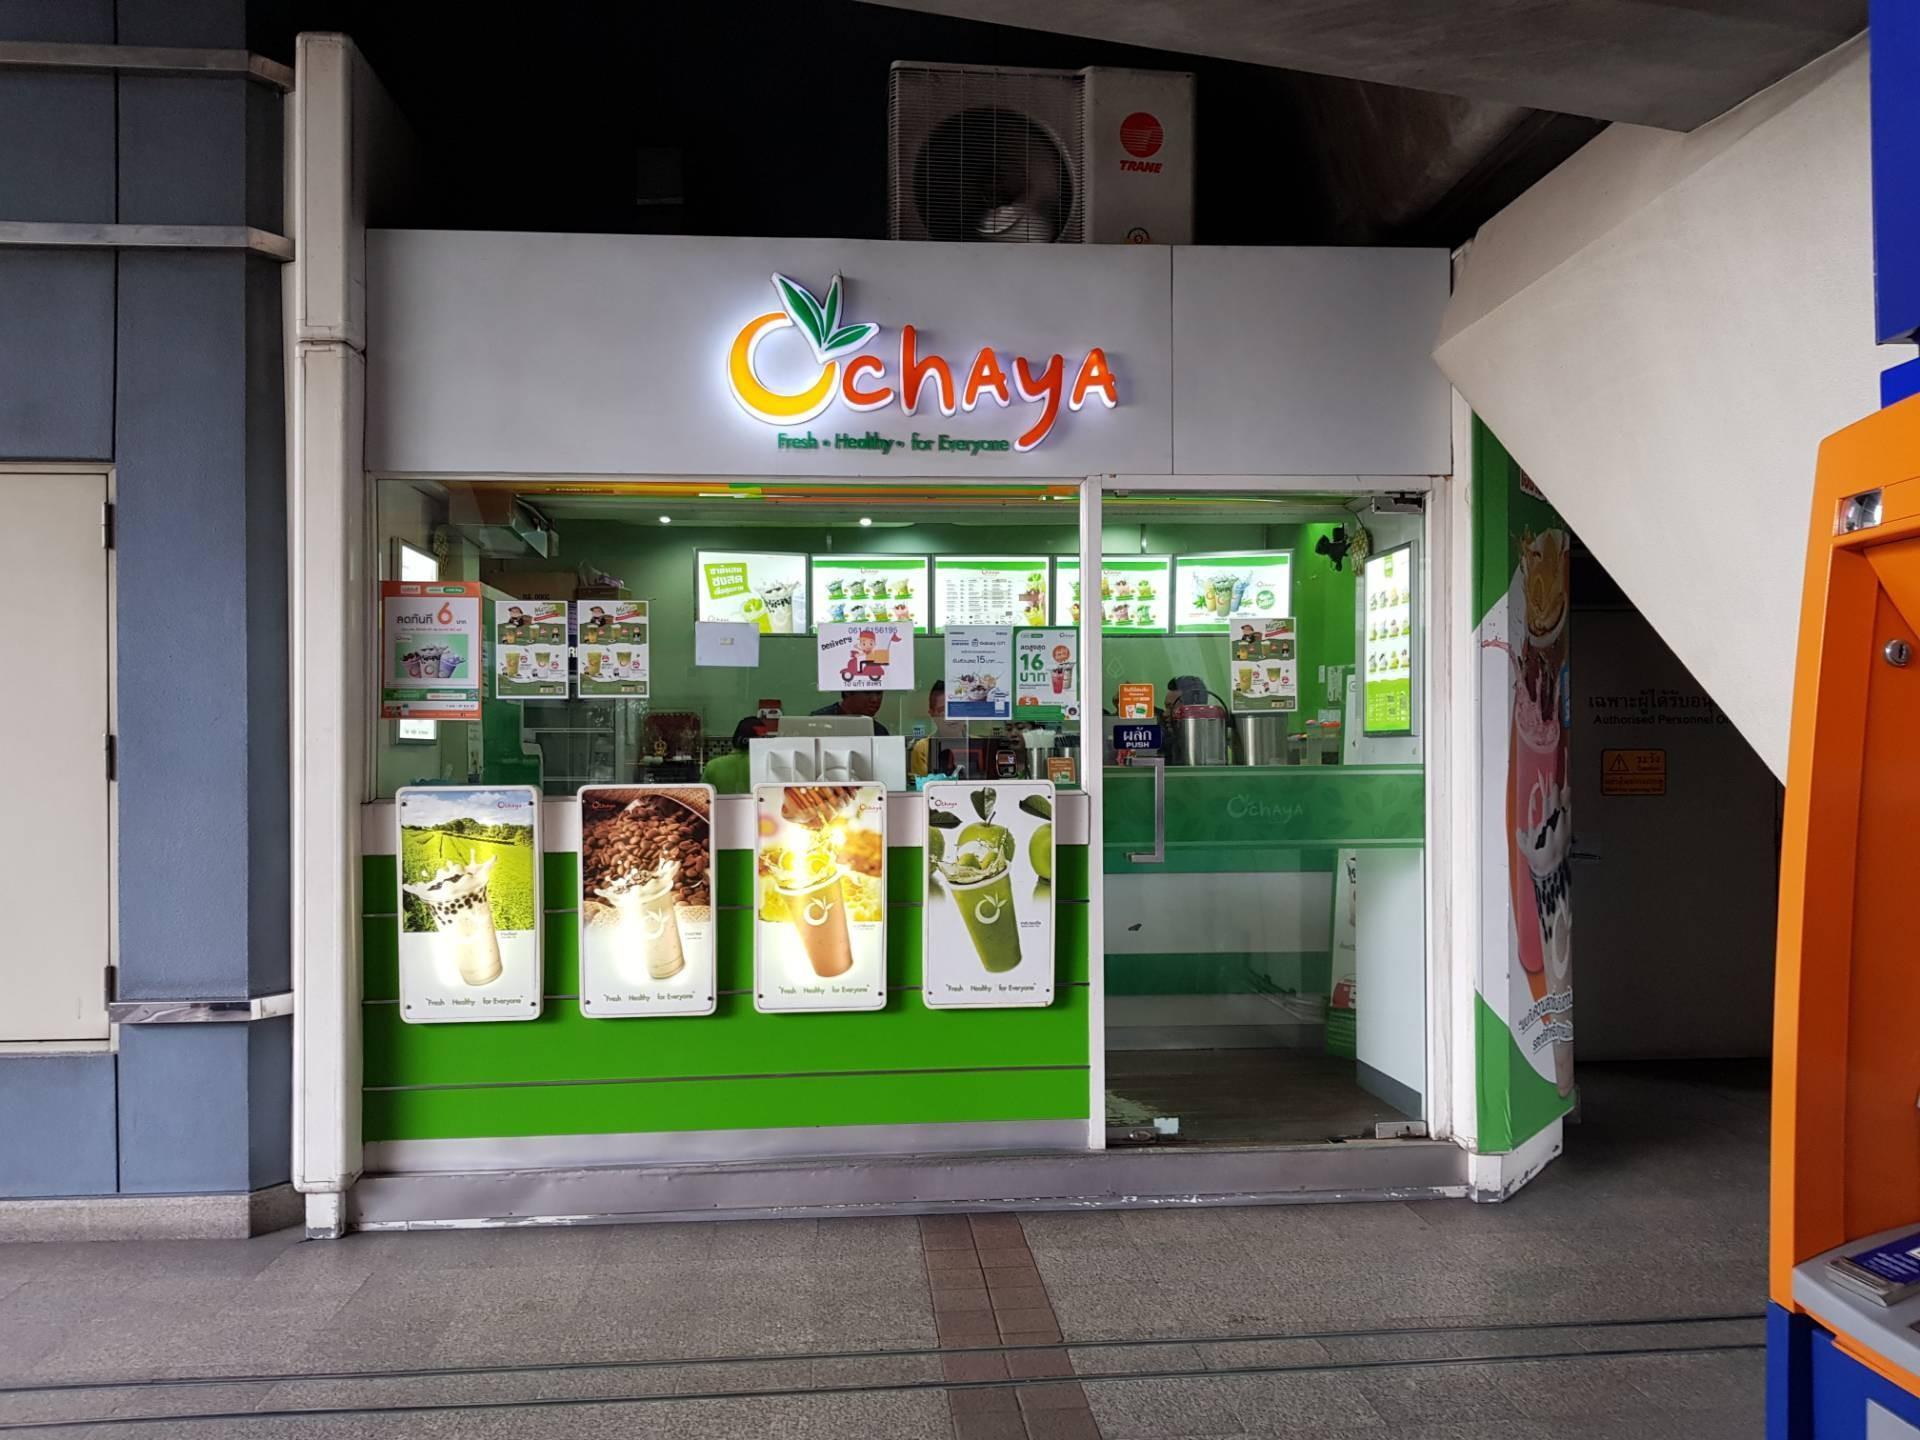 Ochaya สถานีอนุสาวรีย์ชัยสมรภูมิ